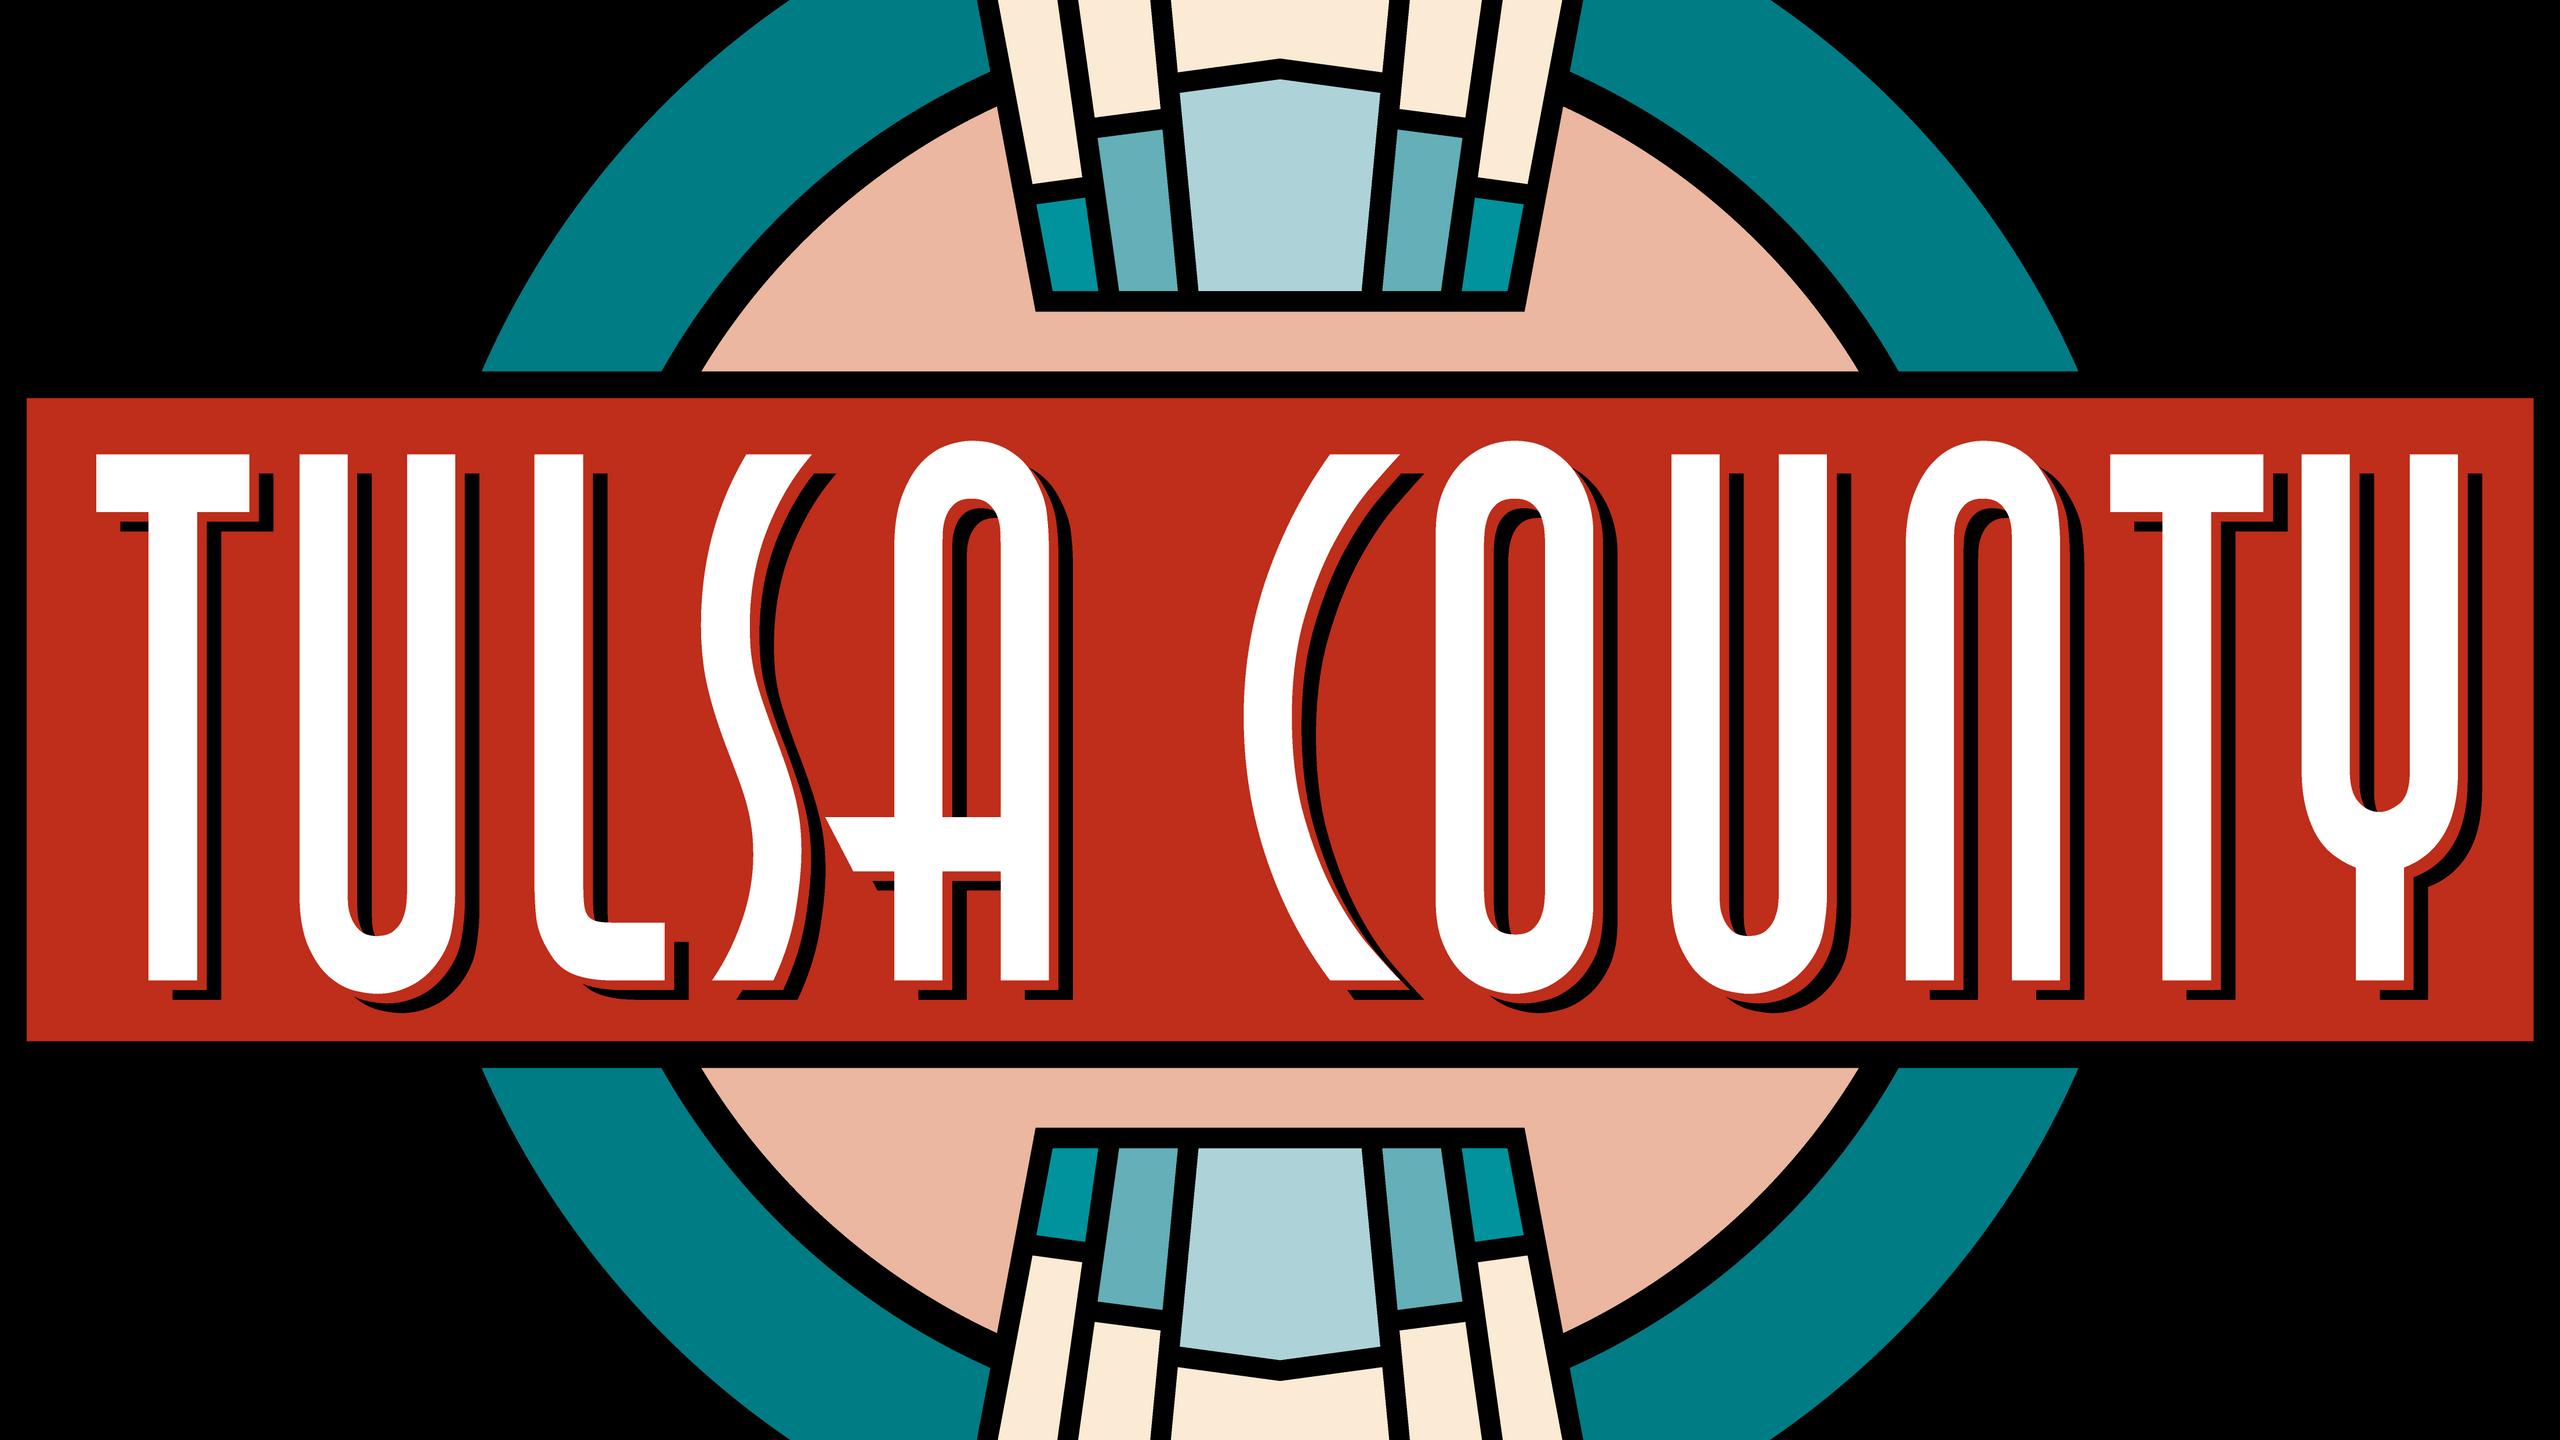 Tulsa Co. Maintenance Facilities